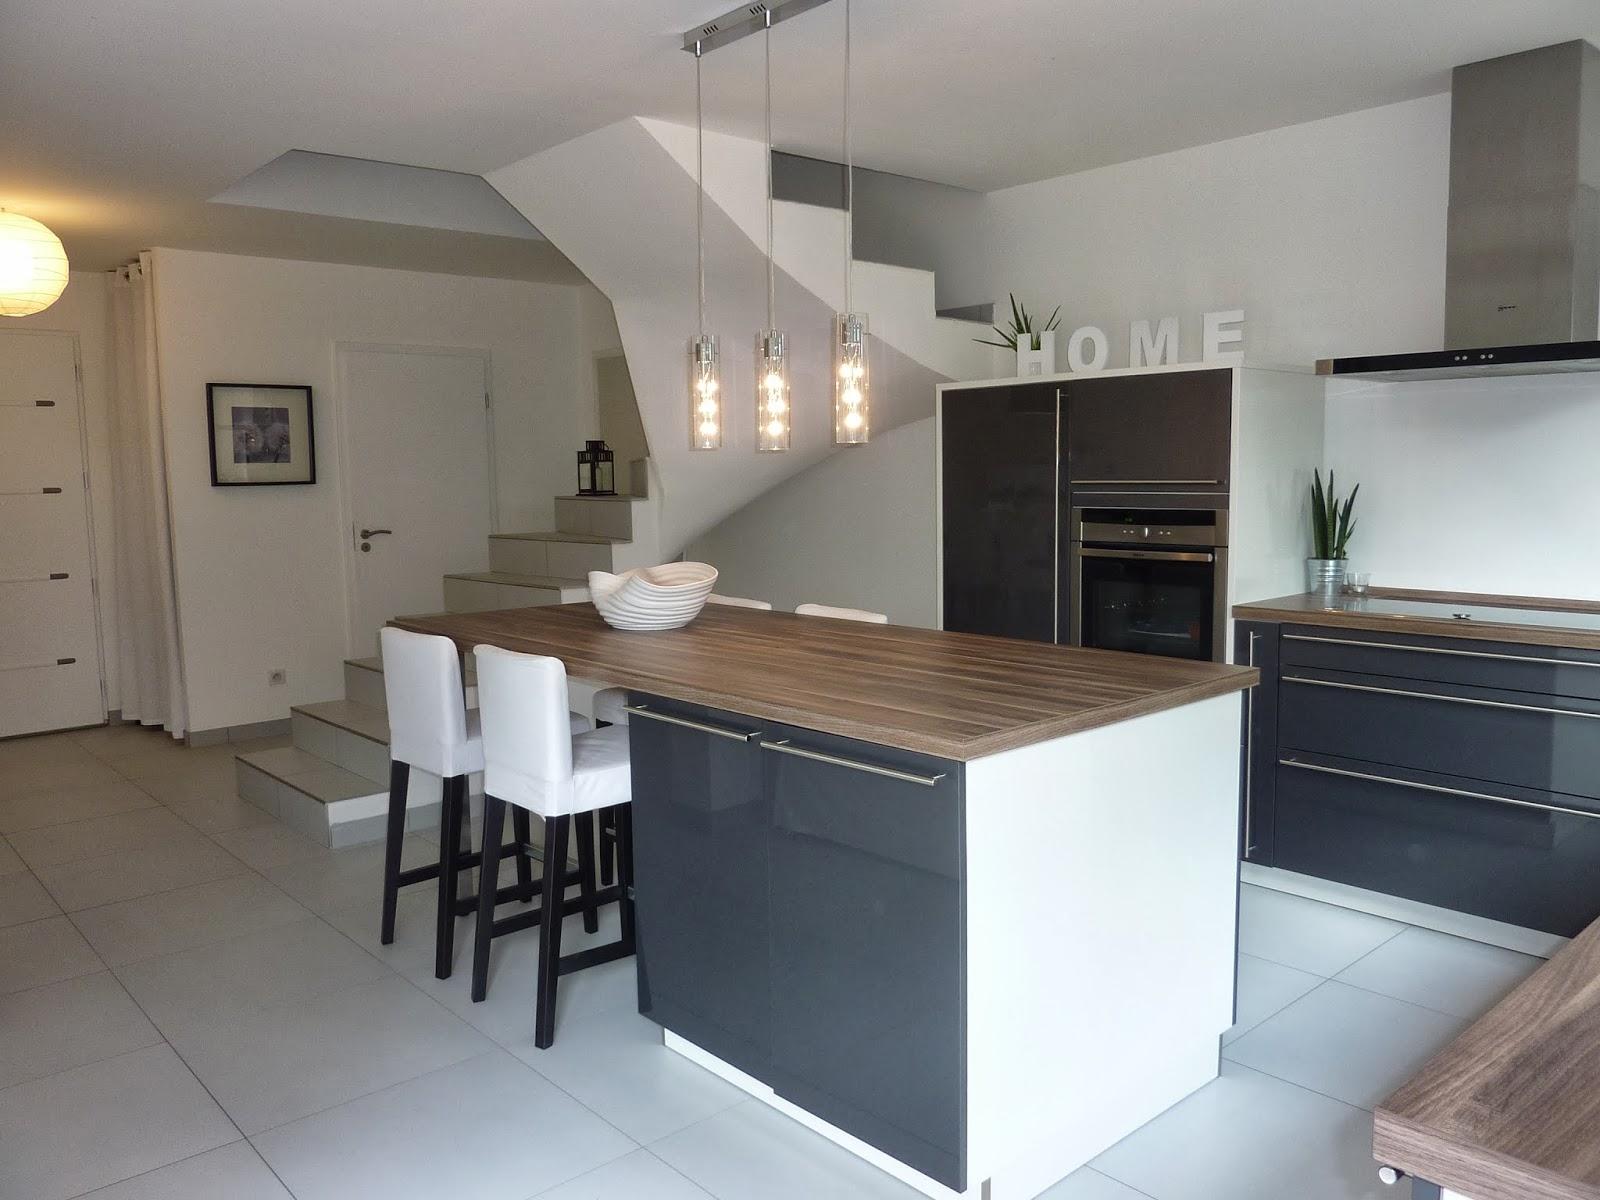 soggiorno cucina open space ikea ~ dragtime for . - Soggiorno Cucina Open Space Ikea 2